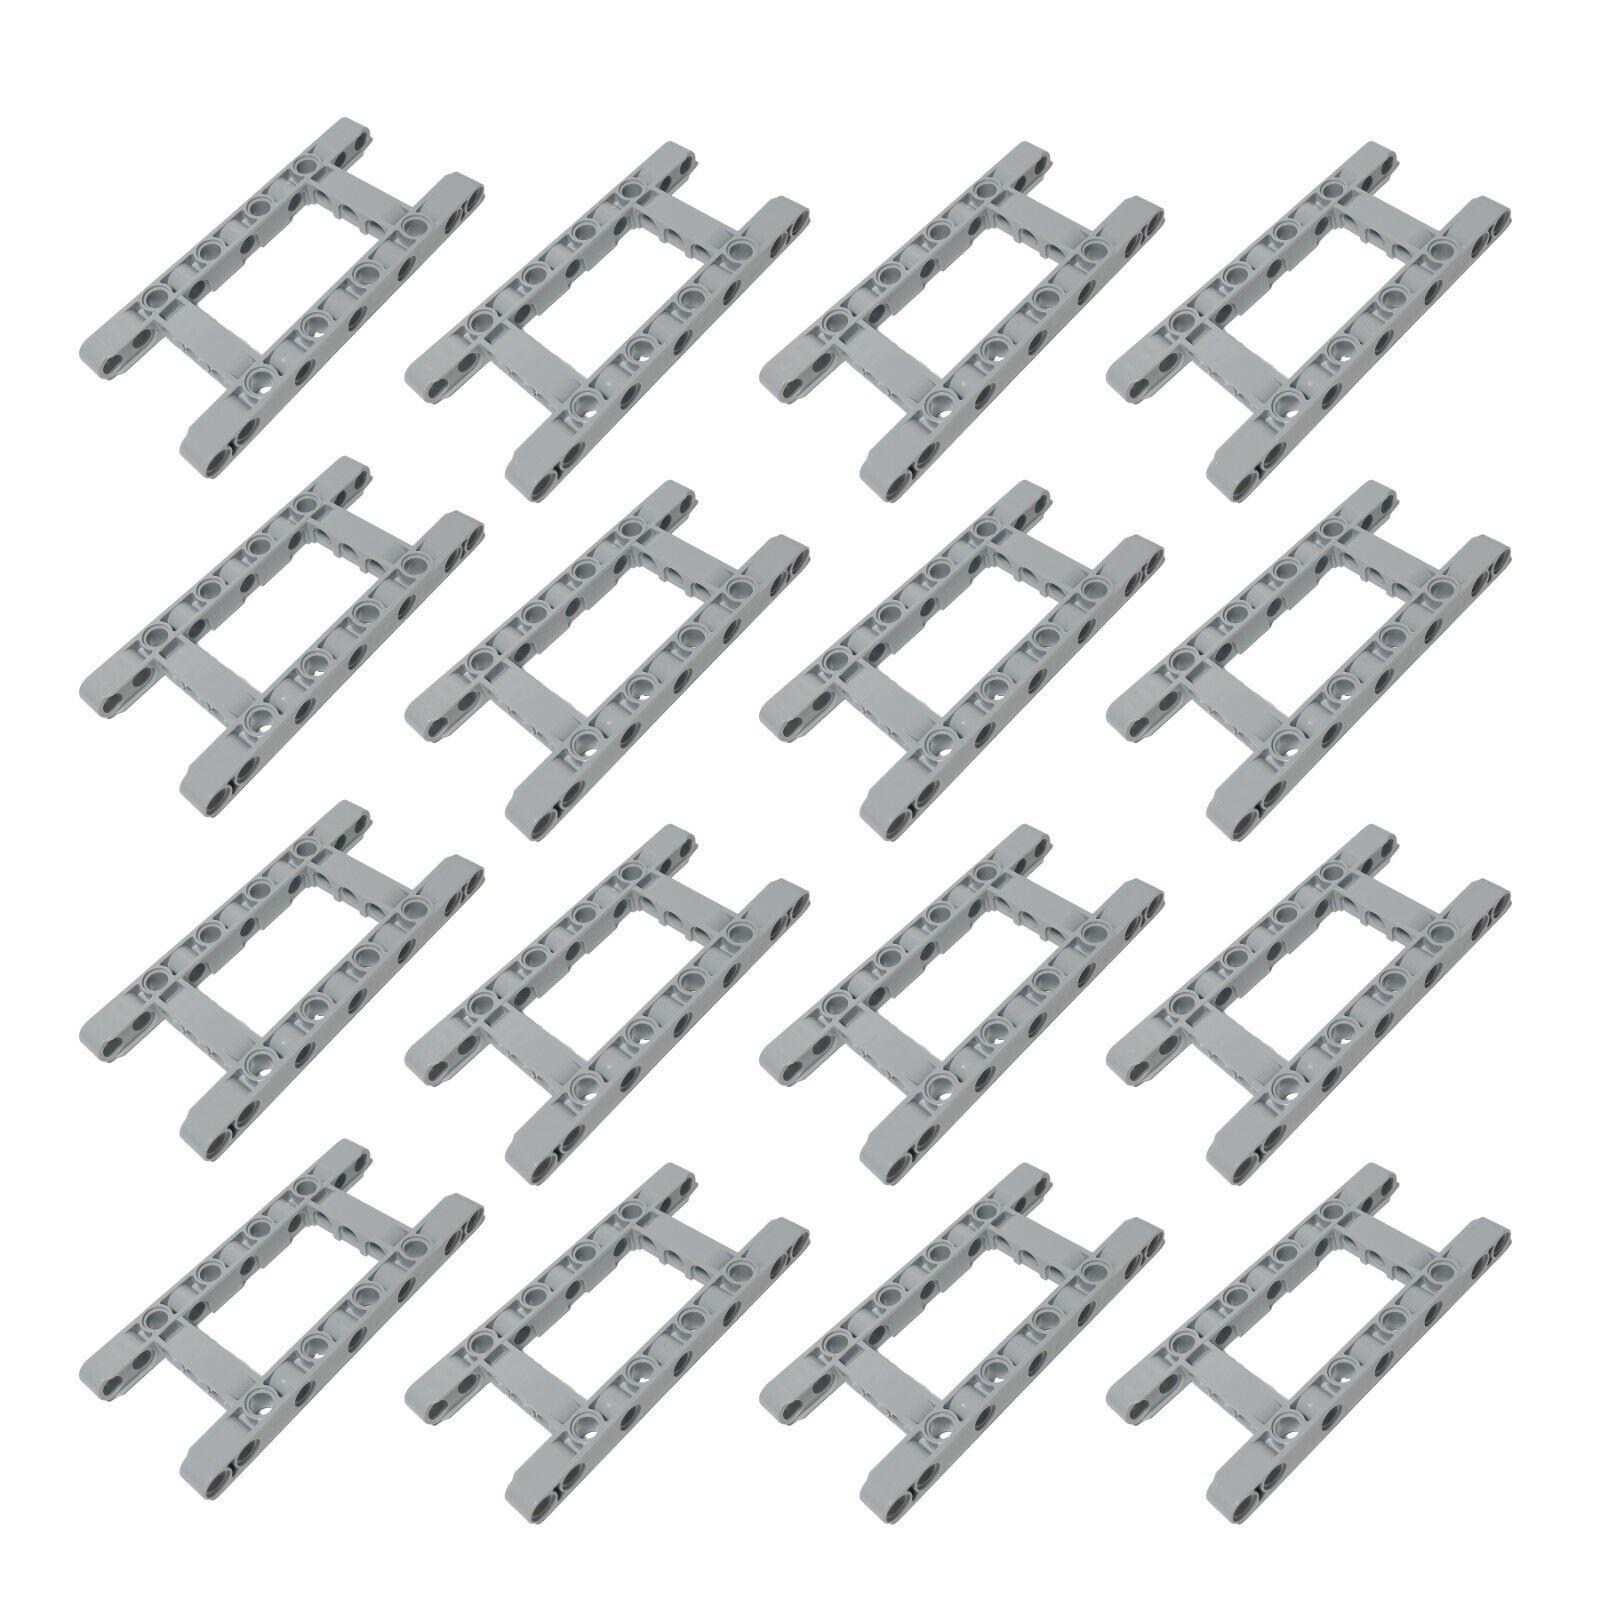 1x Lego Technic NEU Rahmen Liftarm 5 x 7 64179 schwarz 6016154 Technik 5x7 NEU